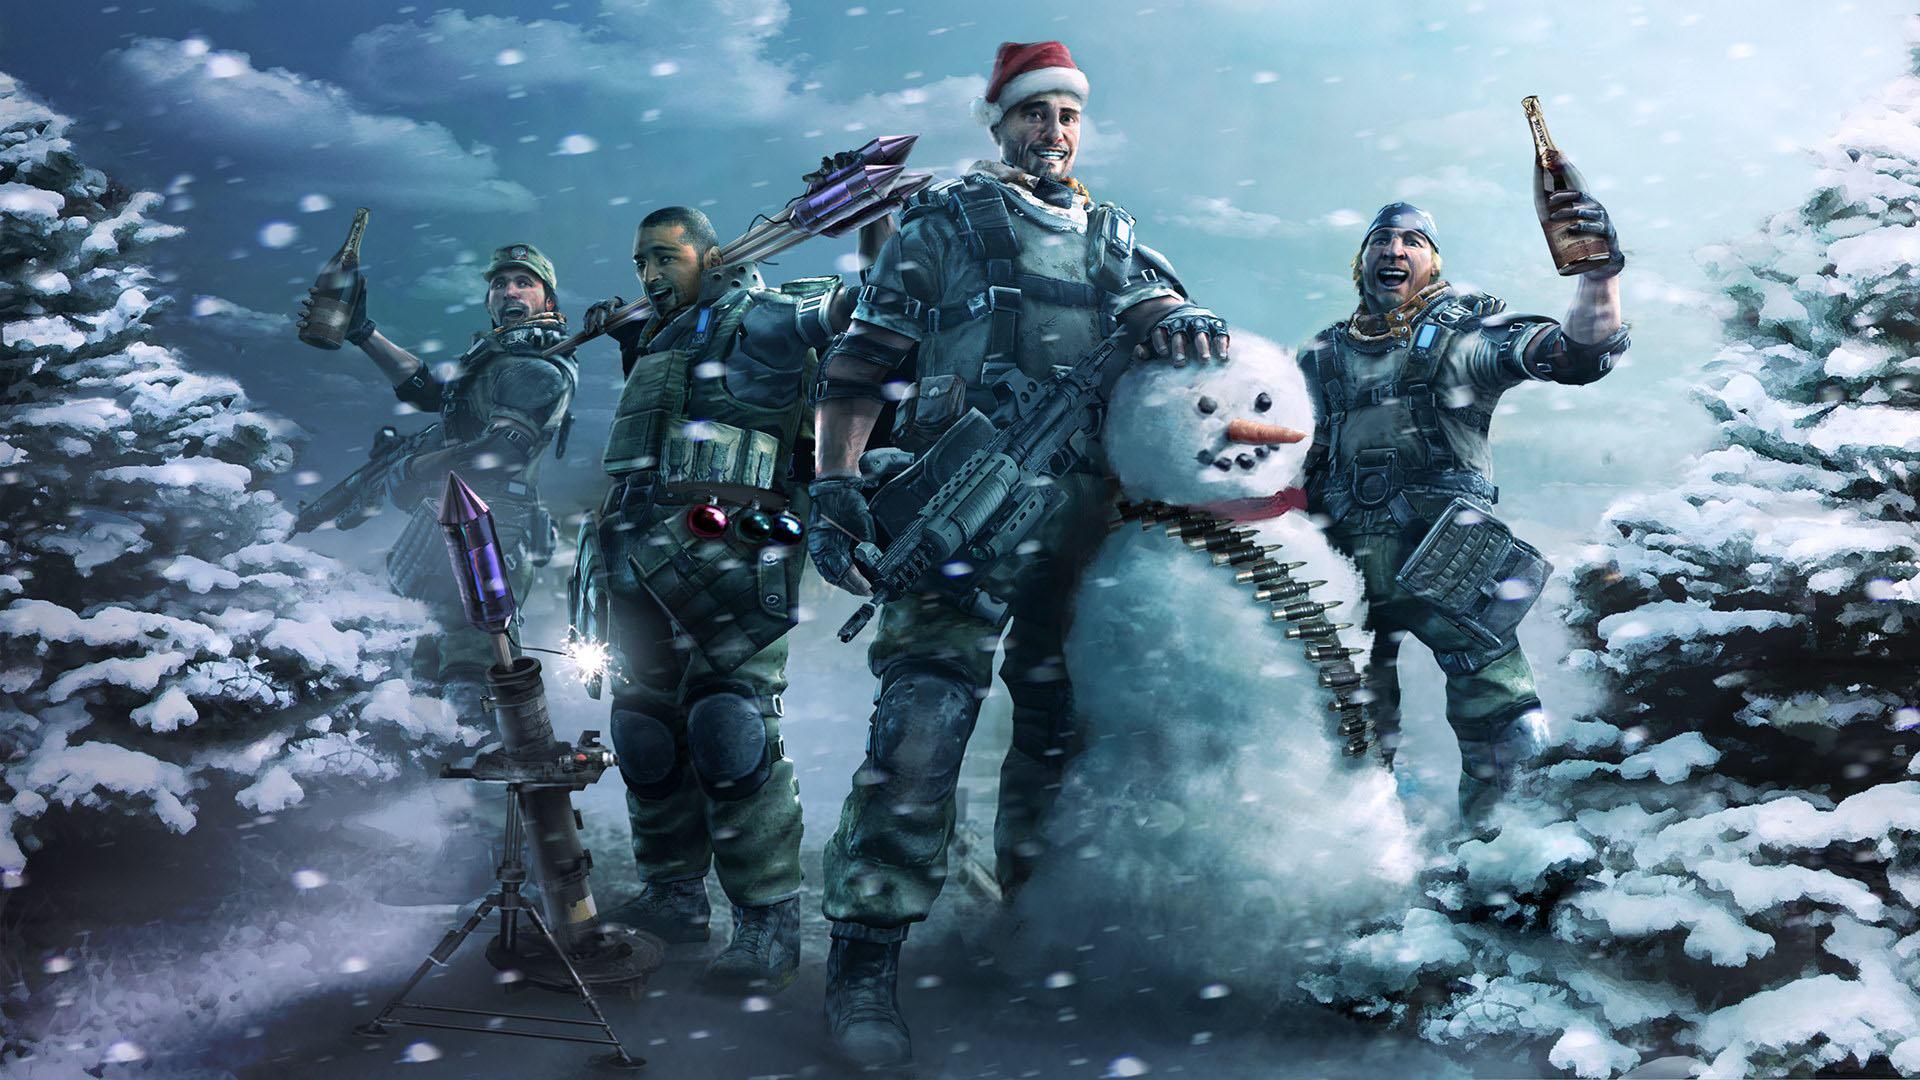 killzone christmas party - Merry Christmas Games